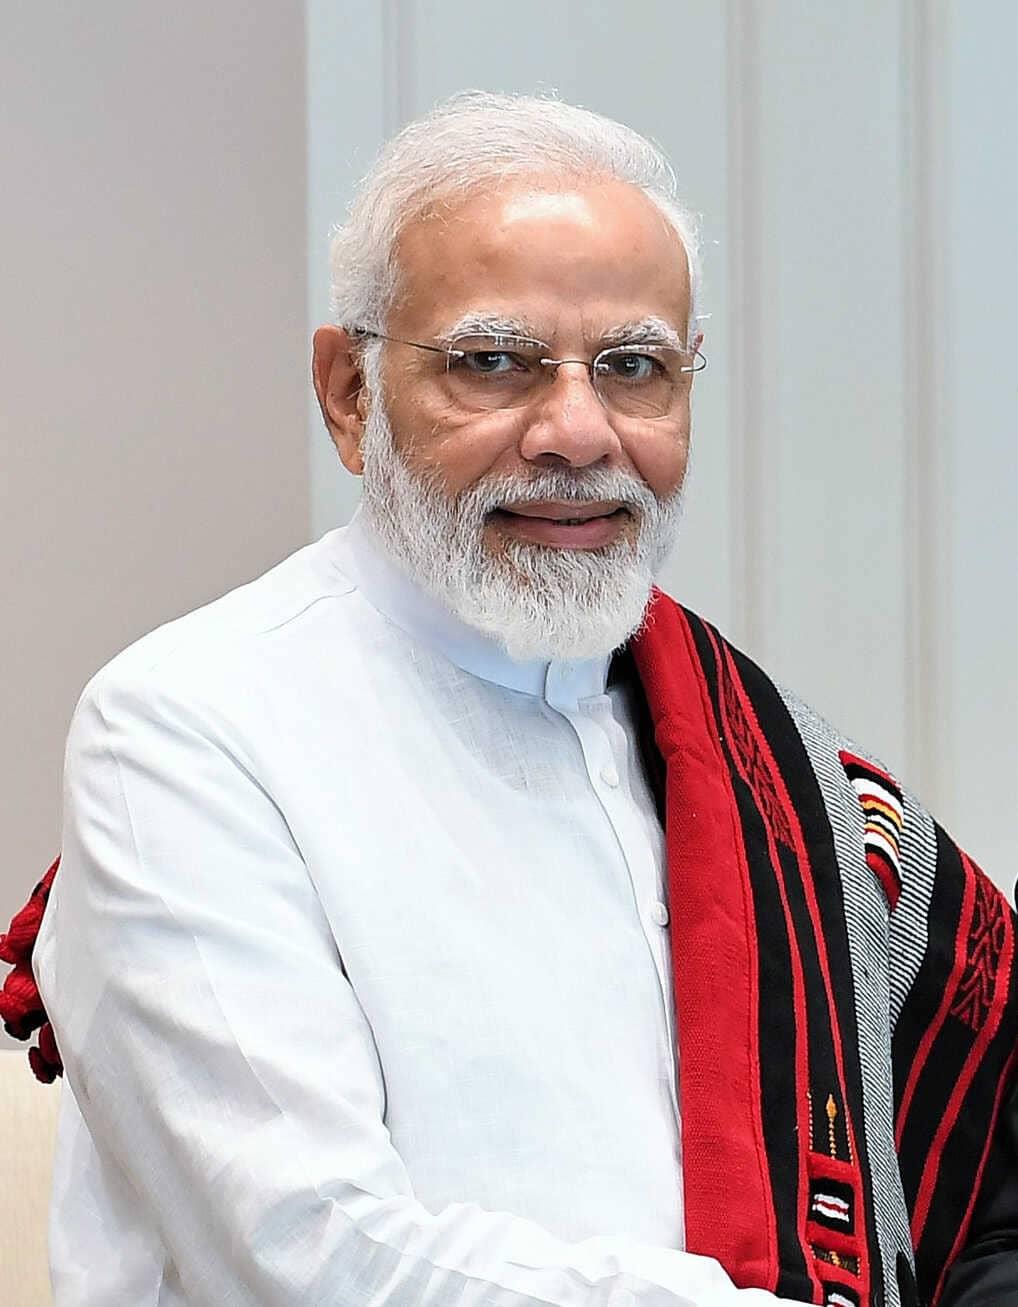 Prime Minister Narendra Modi turns 70